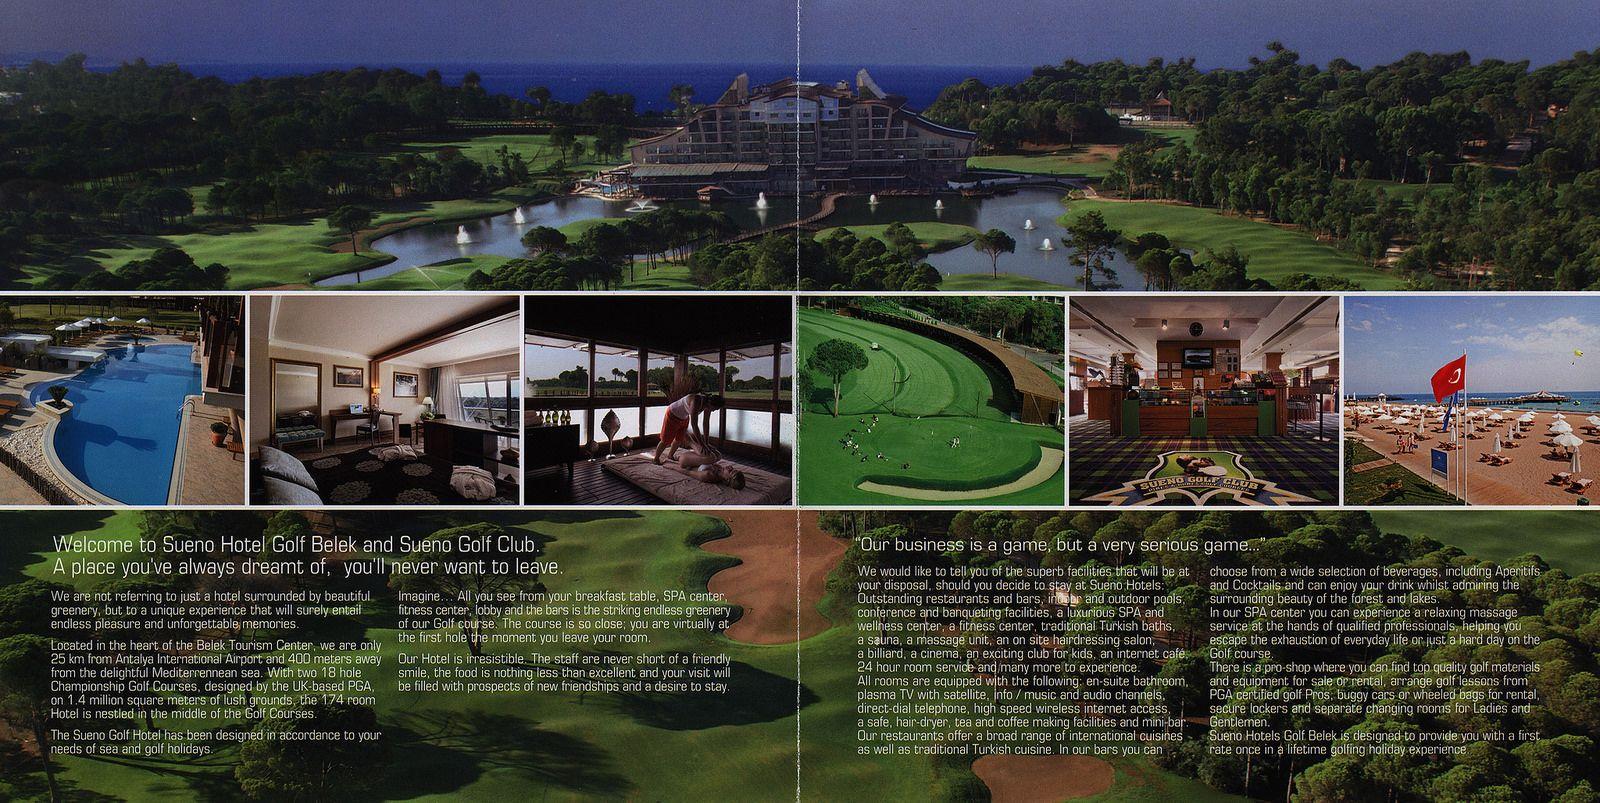 Sueno Hotels Golf Belek 2014 2 Antalya Province Turkey Turkey Hotels Antalya Hotel